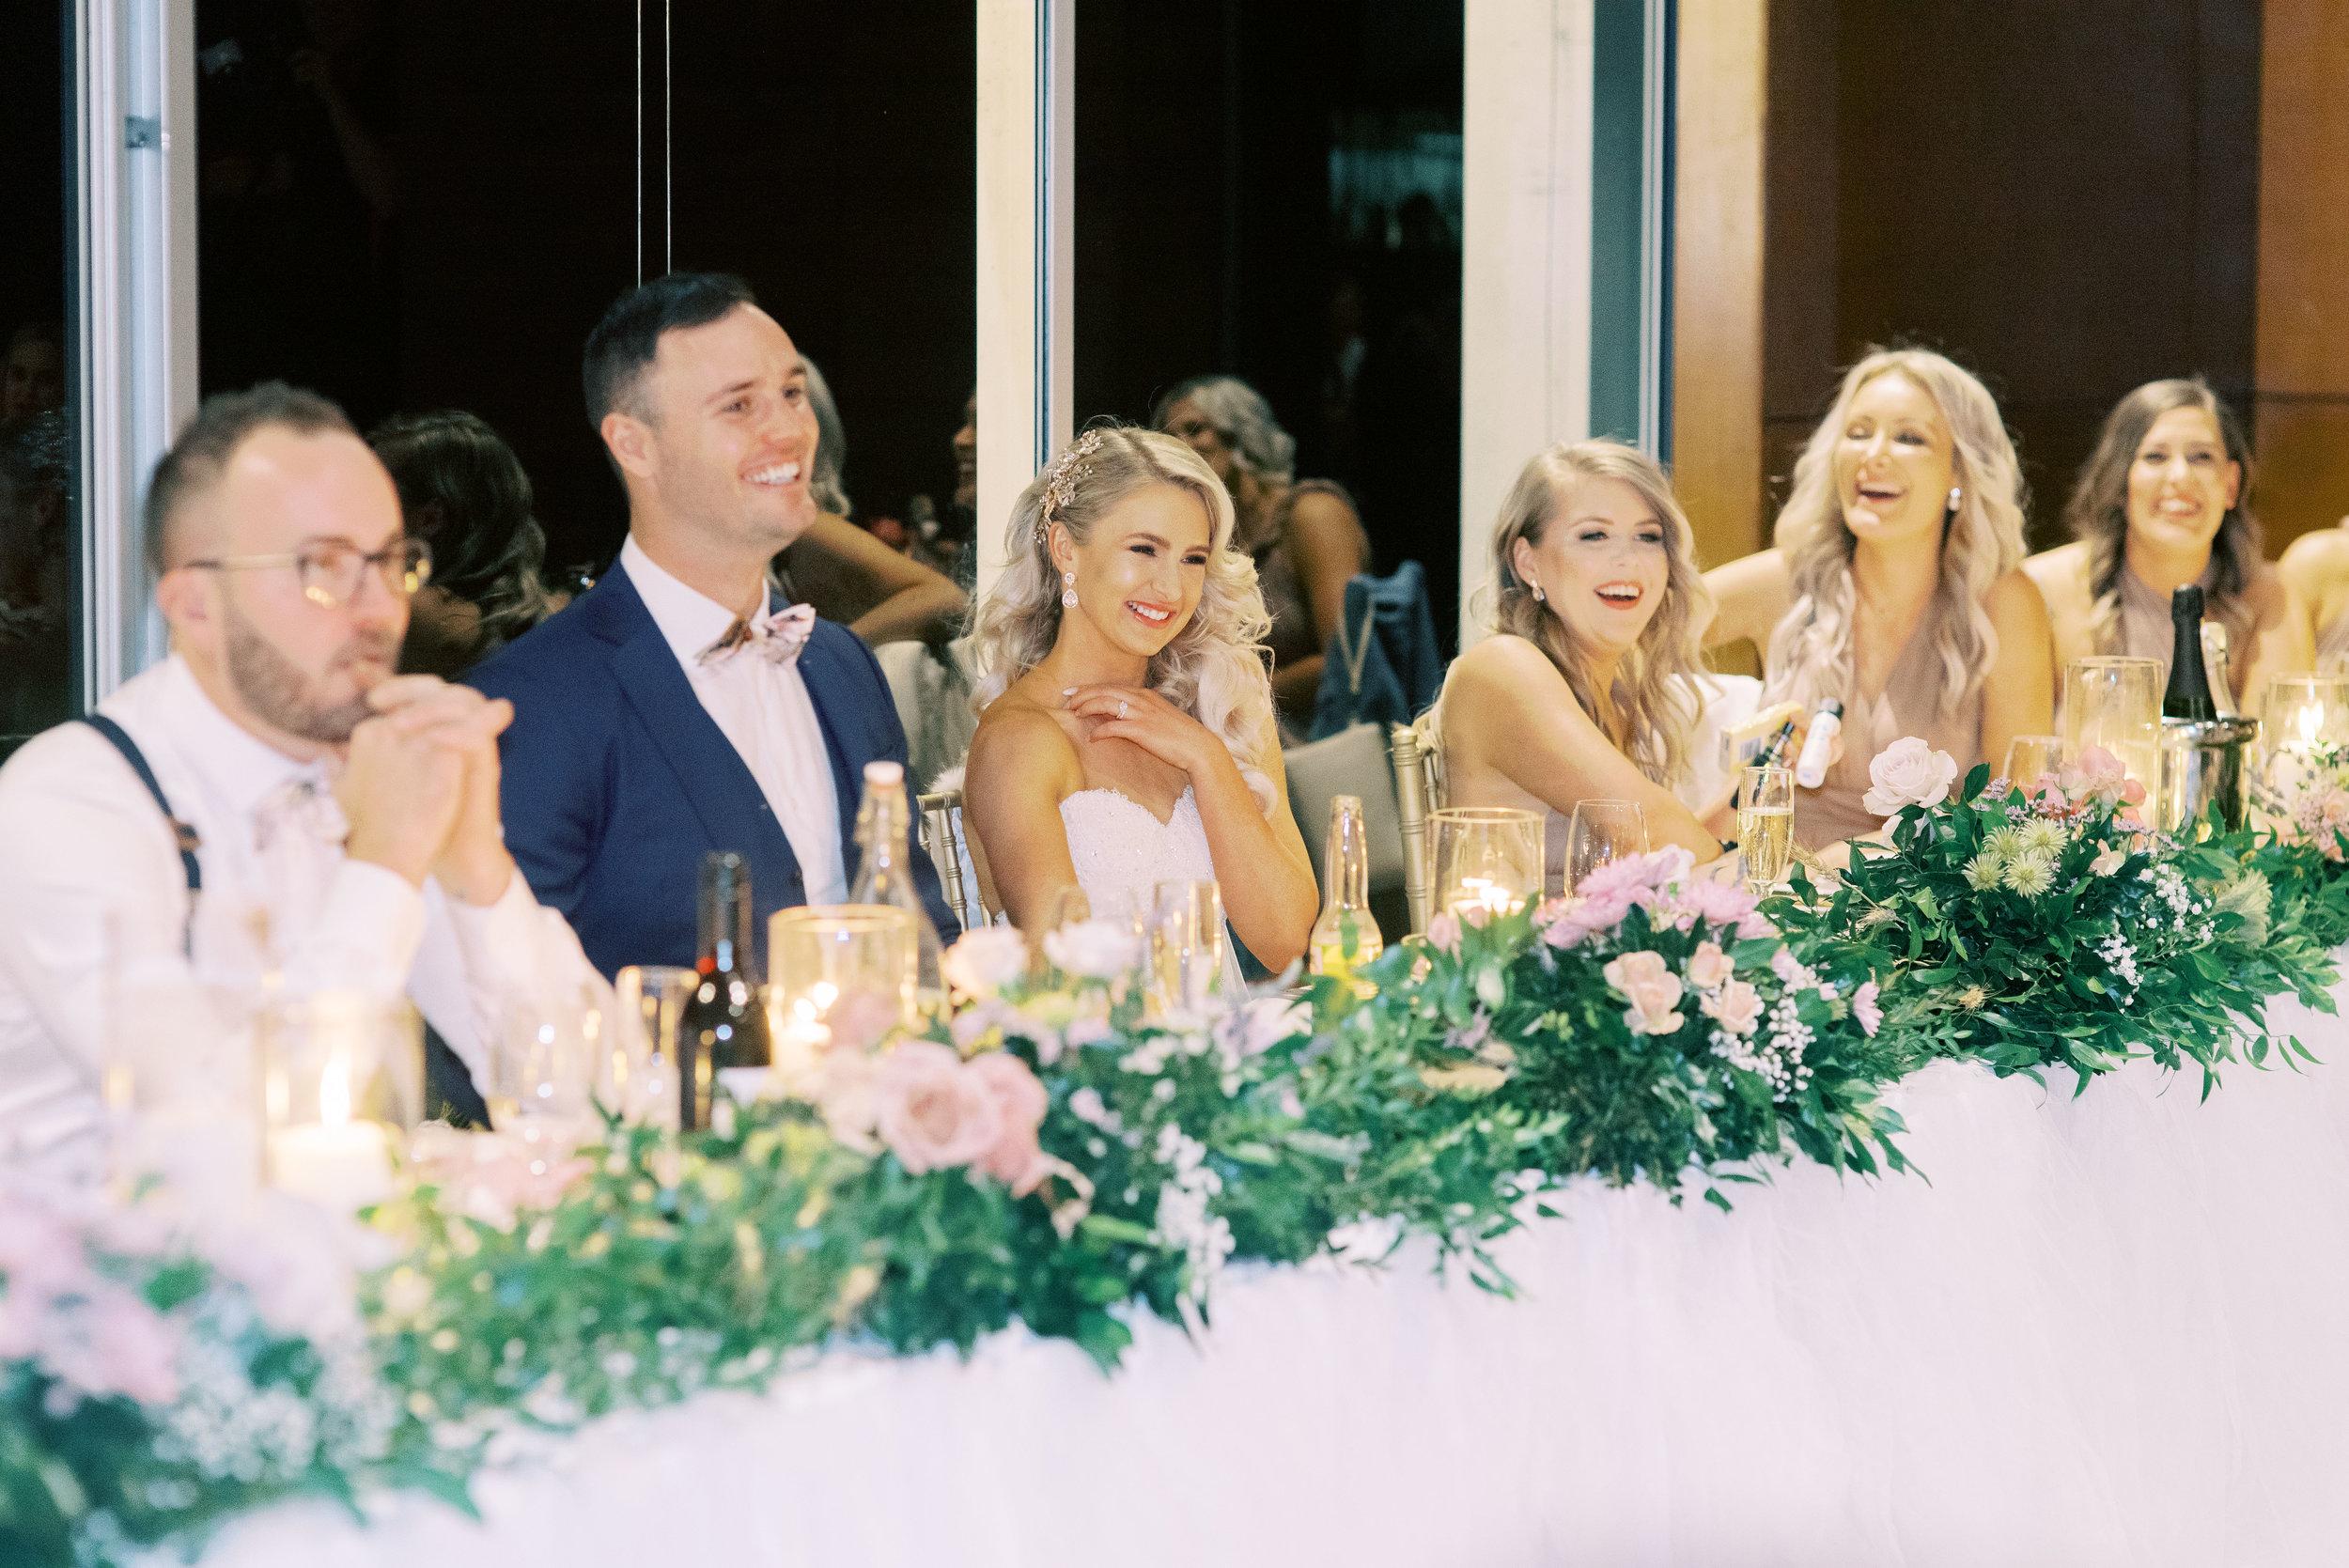 Kooroomba-Vineyard-Lavender-Farm-Wedding-Fine-Art-Lauren-Olivia-73.jpg